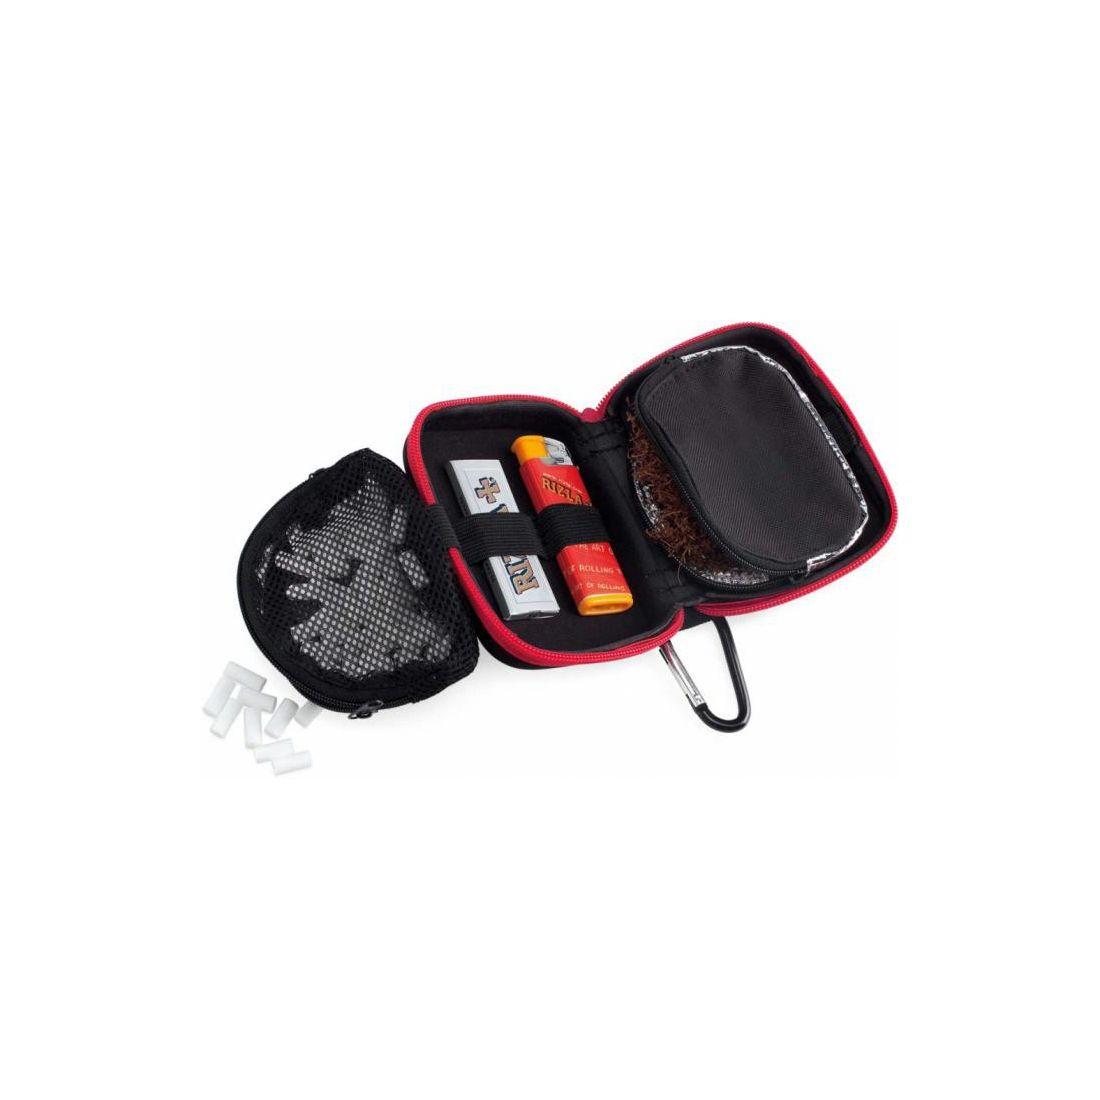 Portatabacco rizla sanotint light tabella colori for Colori sanotint light